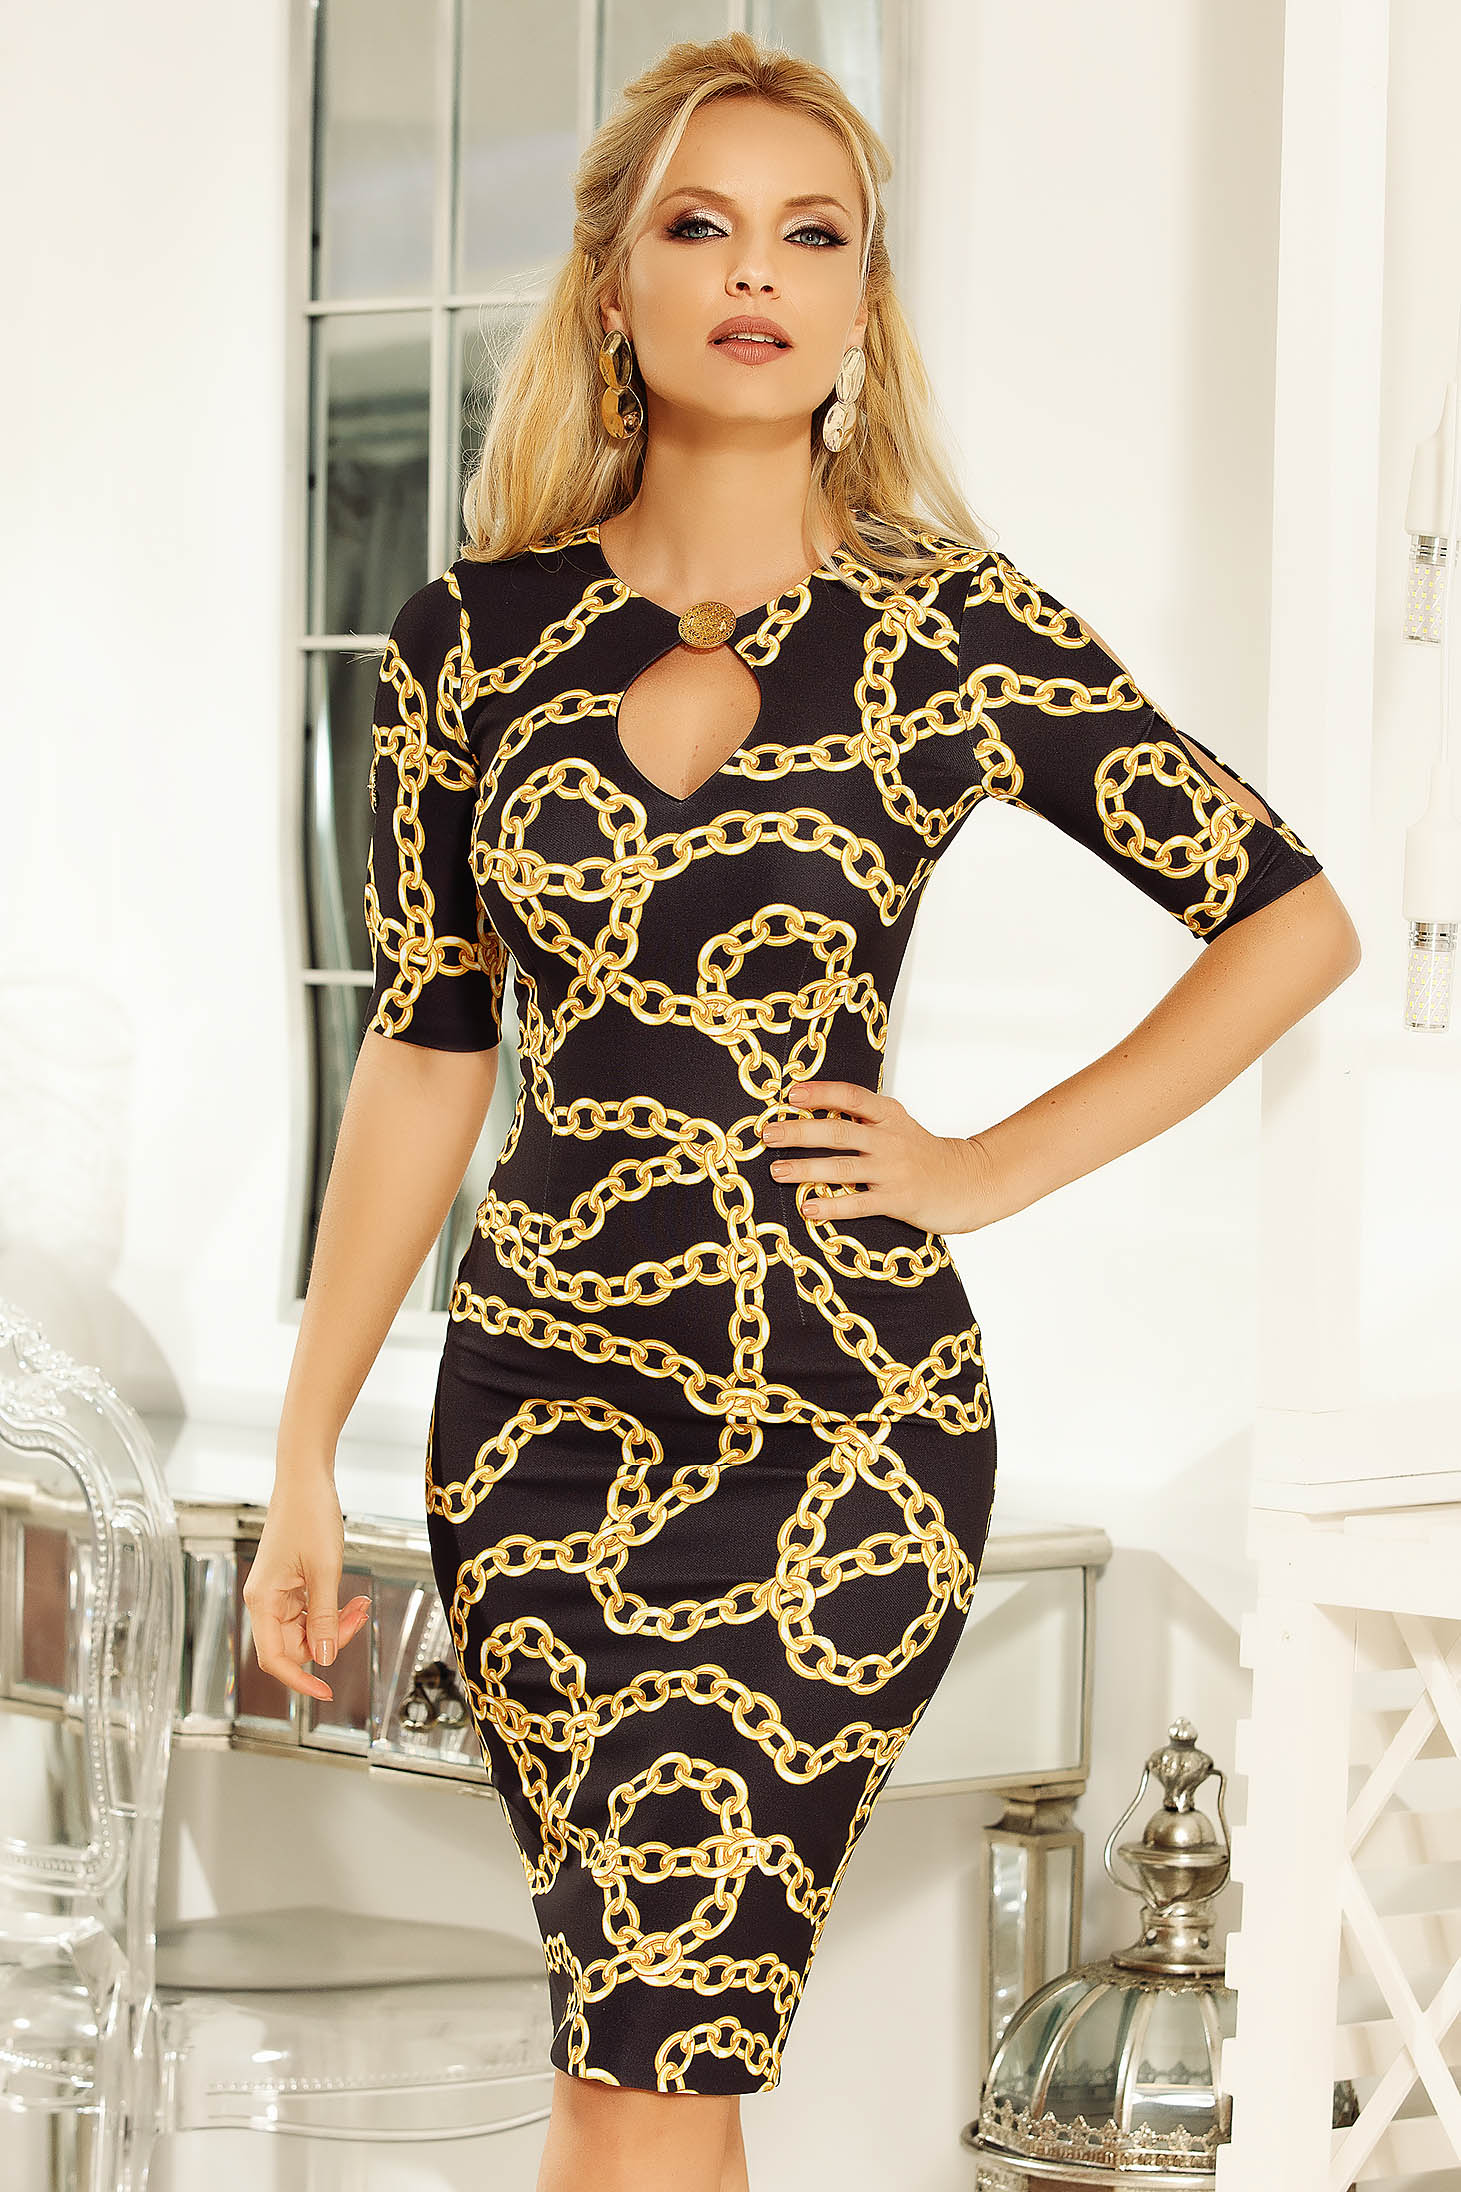 Fofy black elegant pencil dress with graphic print with v-neckline